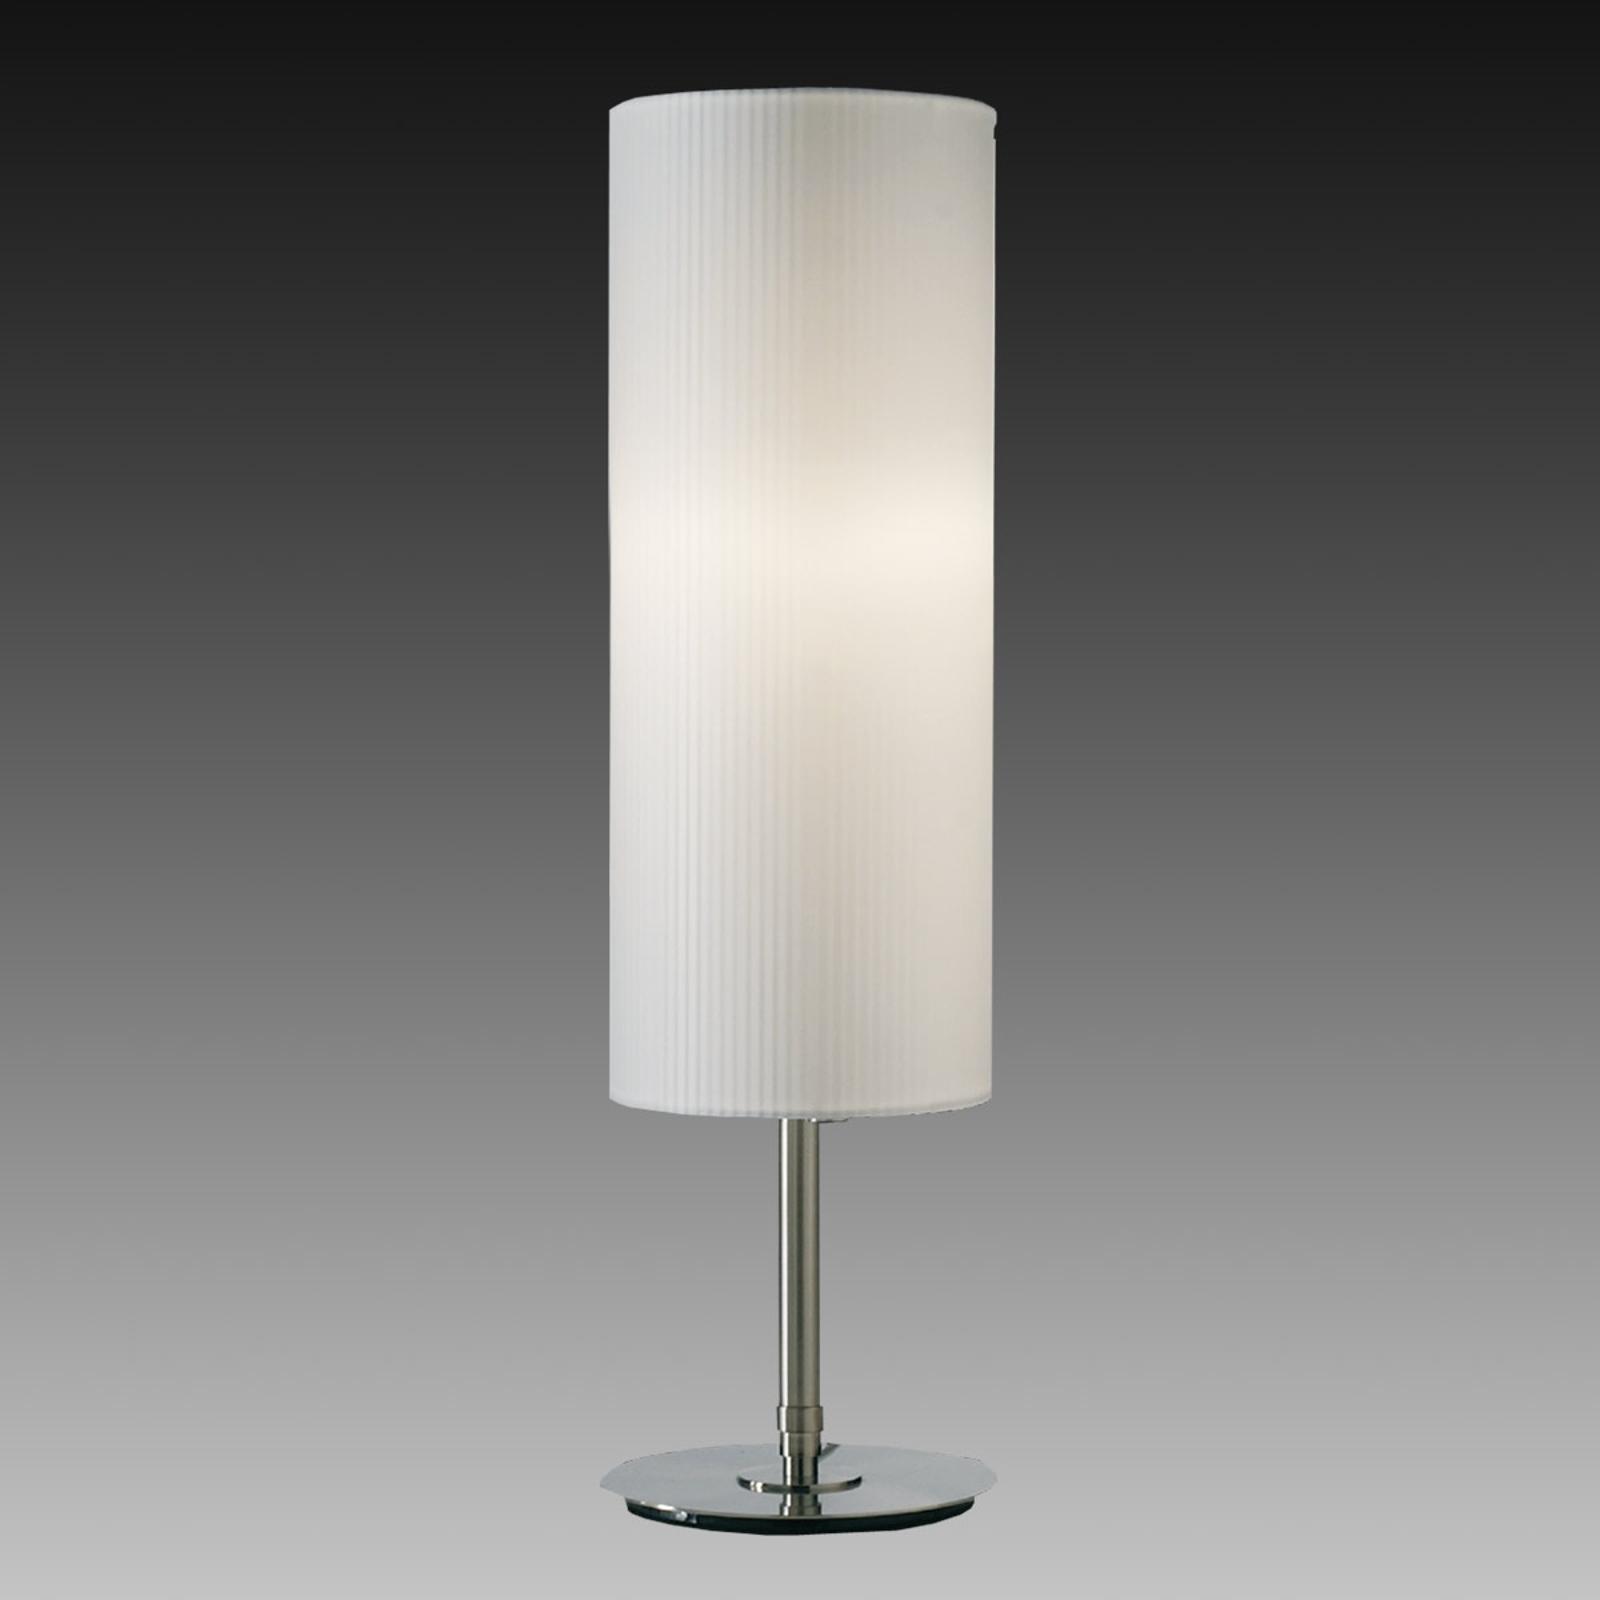 Grote en hoge tafellamp Benito 76 cm